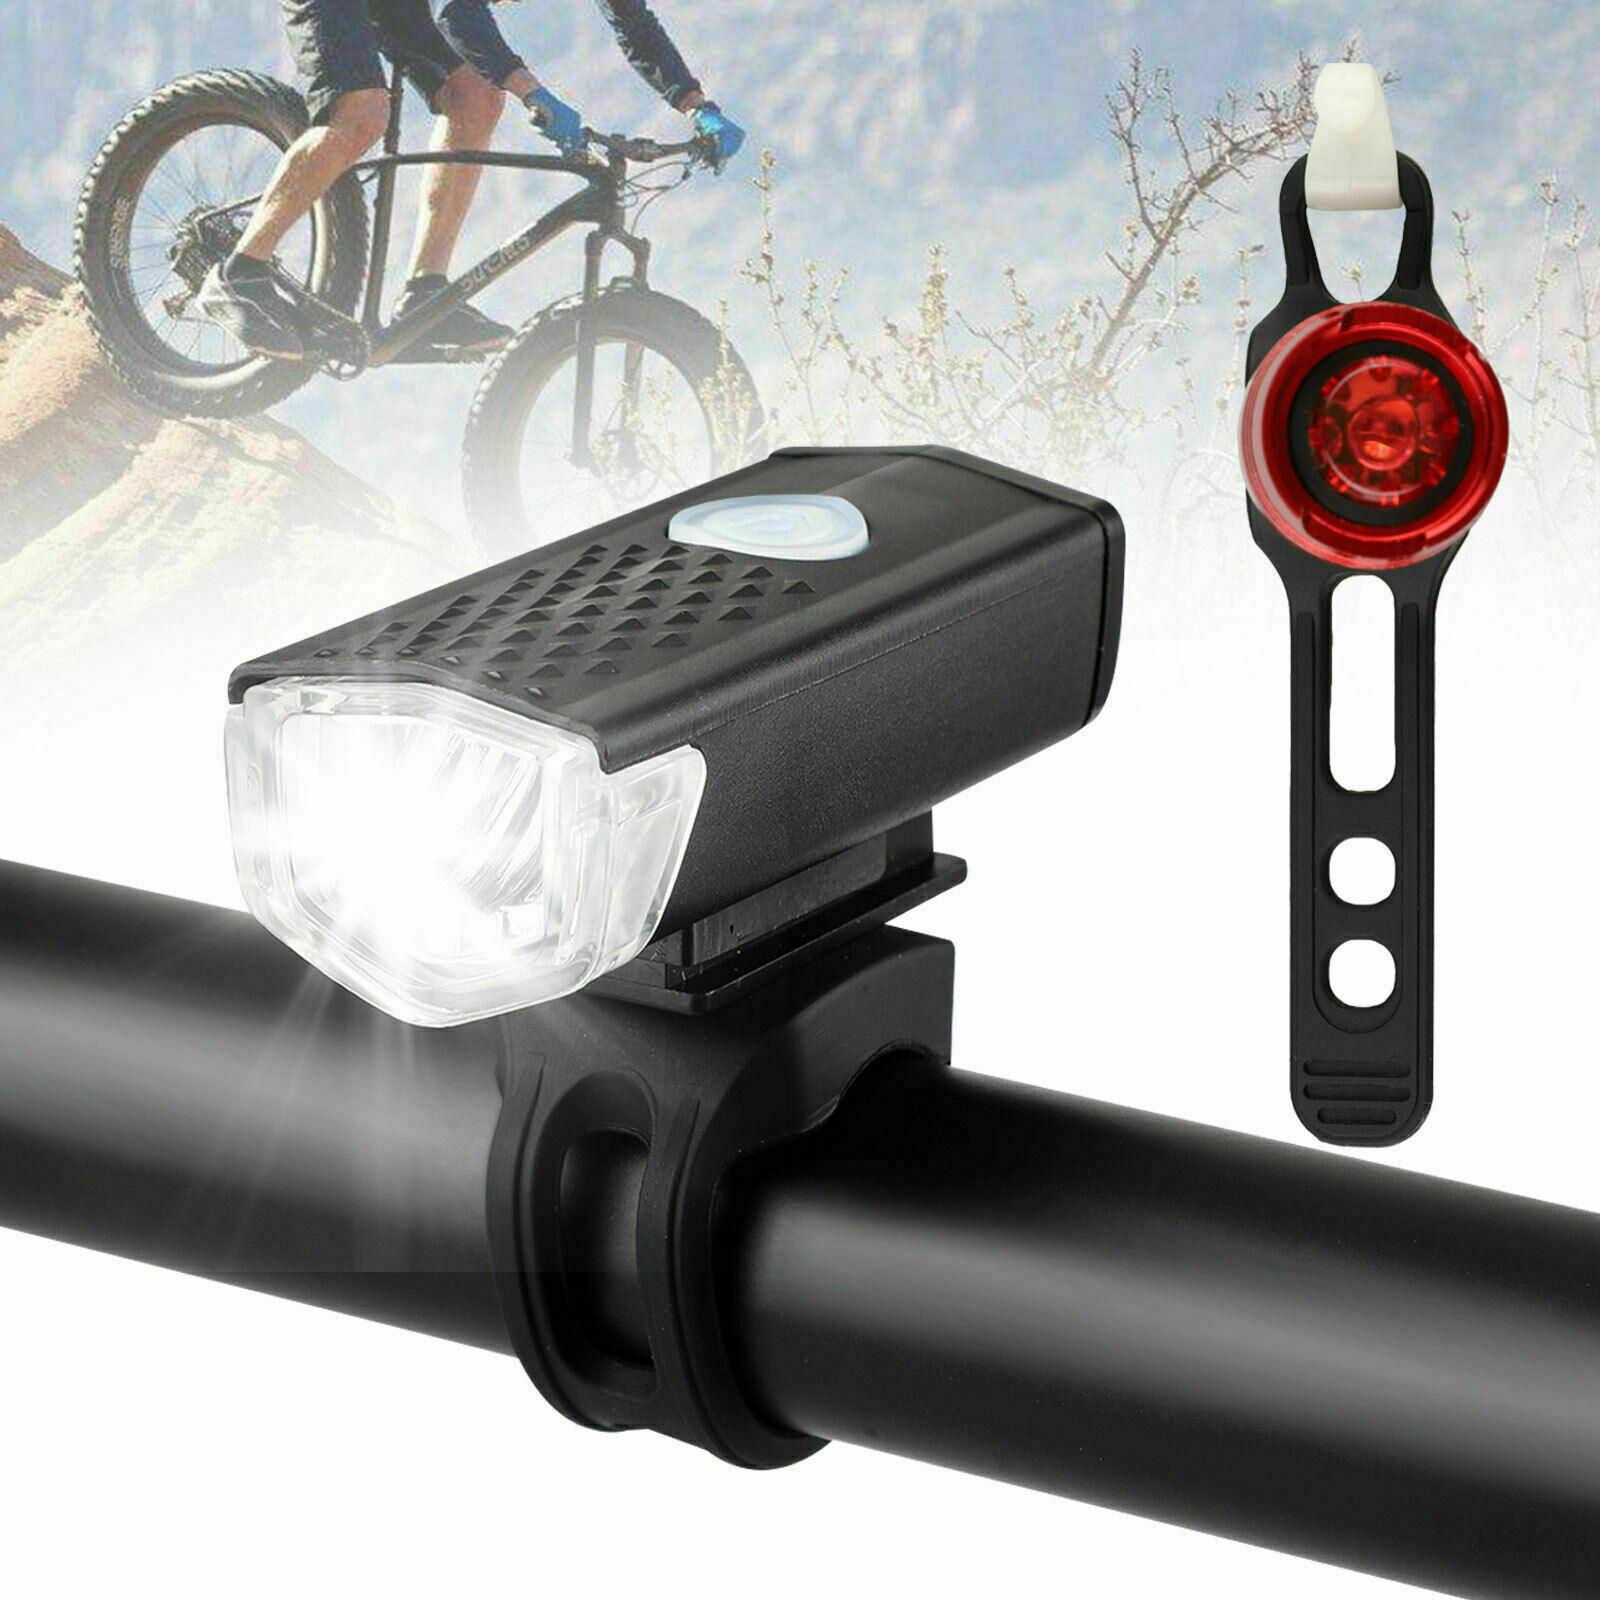 LED Bicycle Bright Bike Lamp Safe Riding Flashlight Lamp Set Of Mountaineers